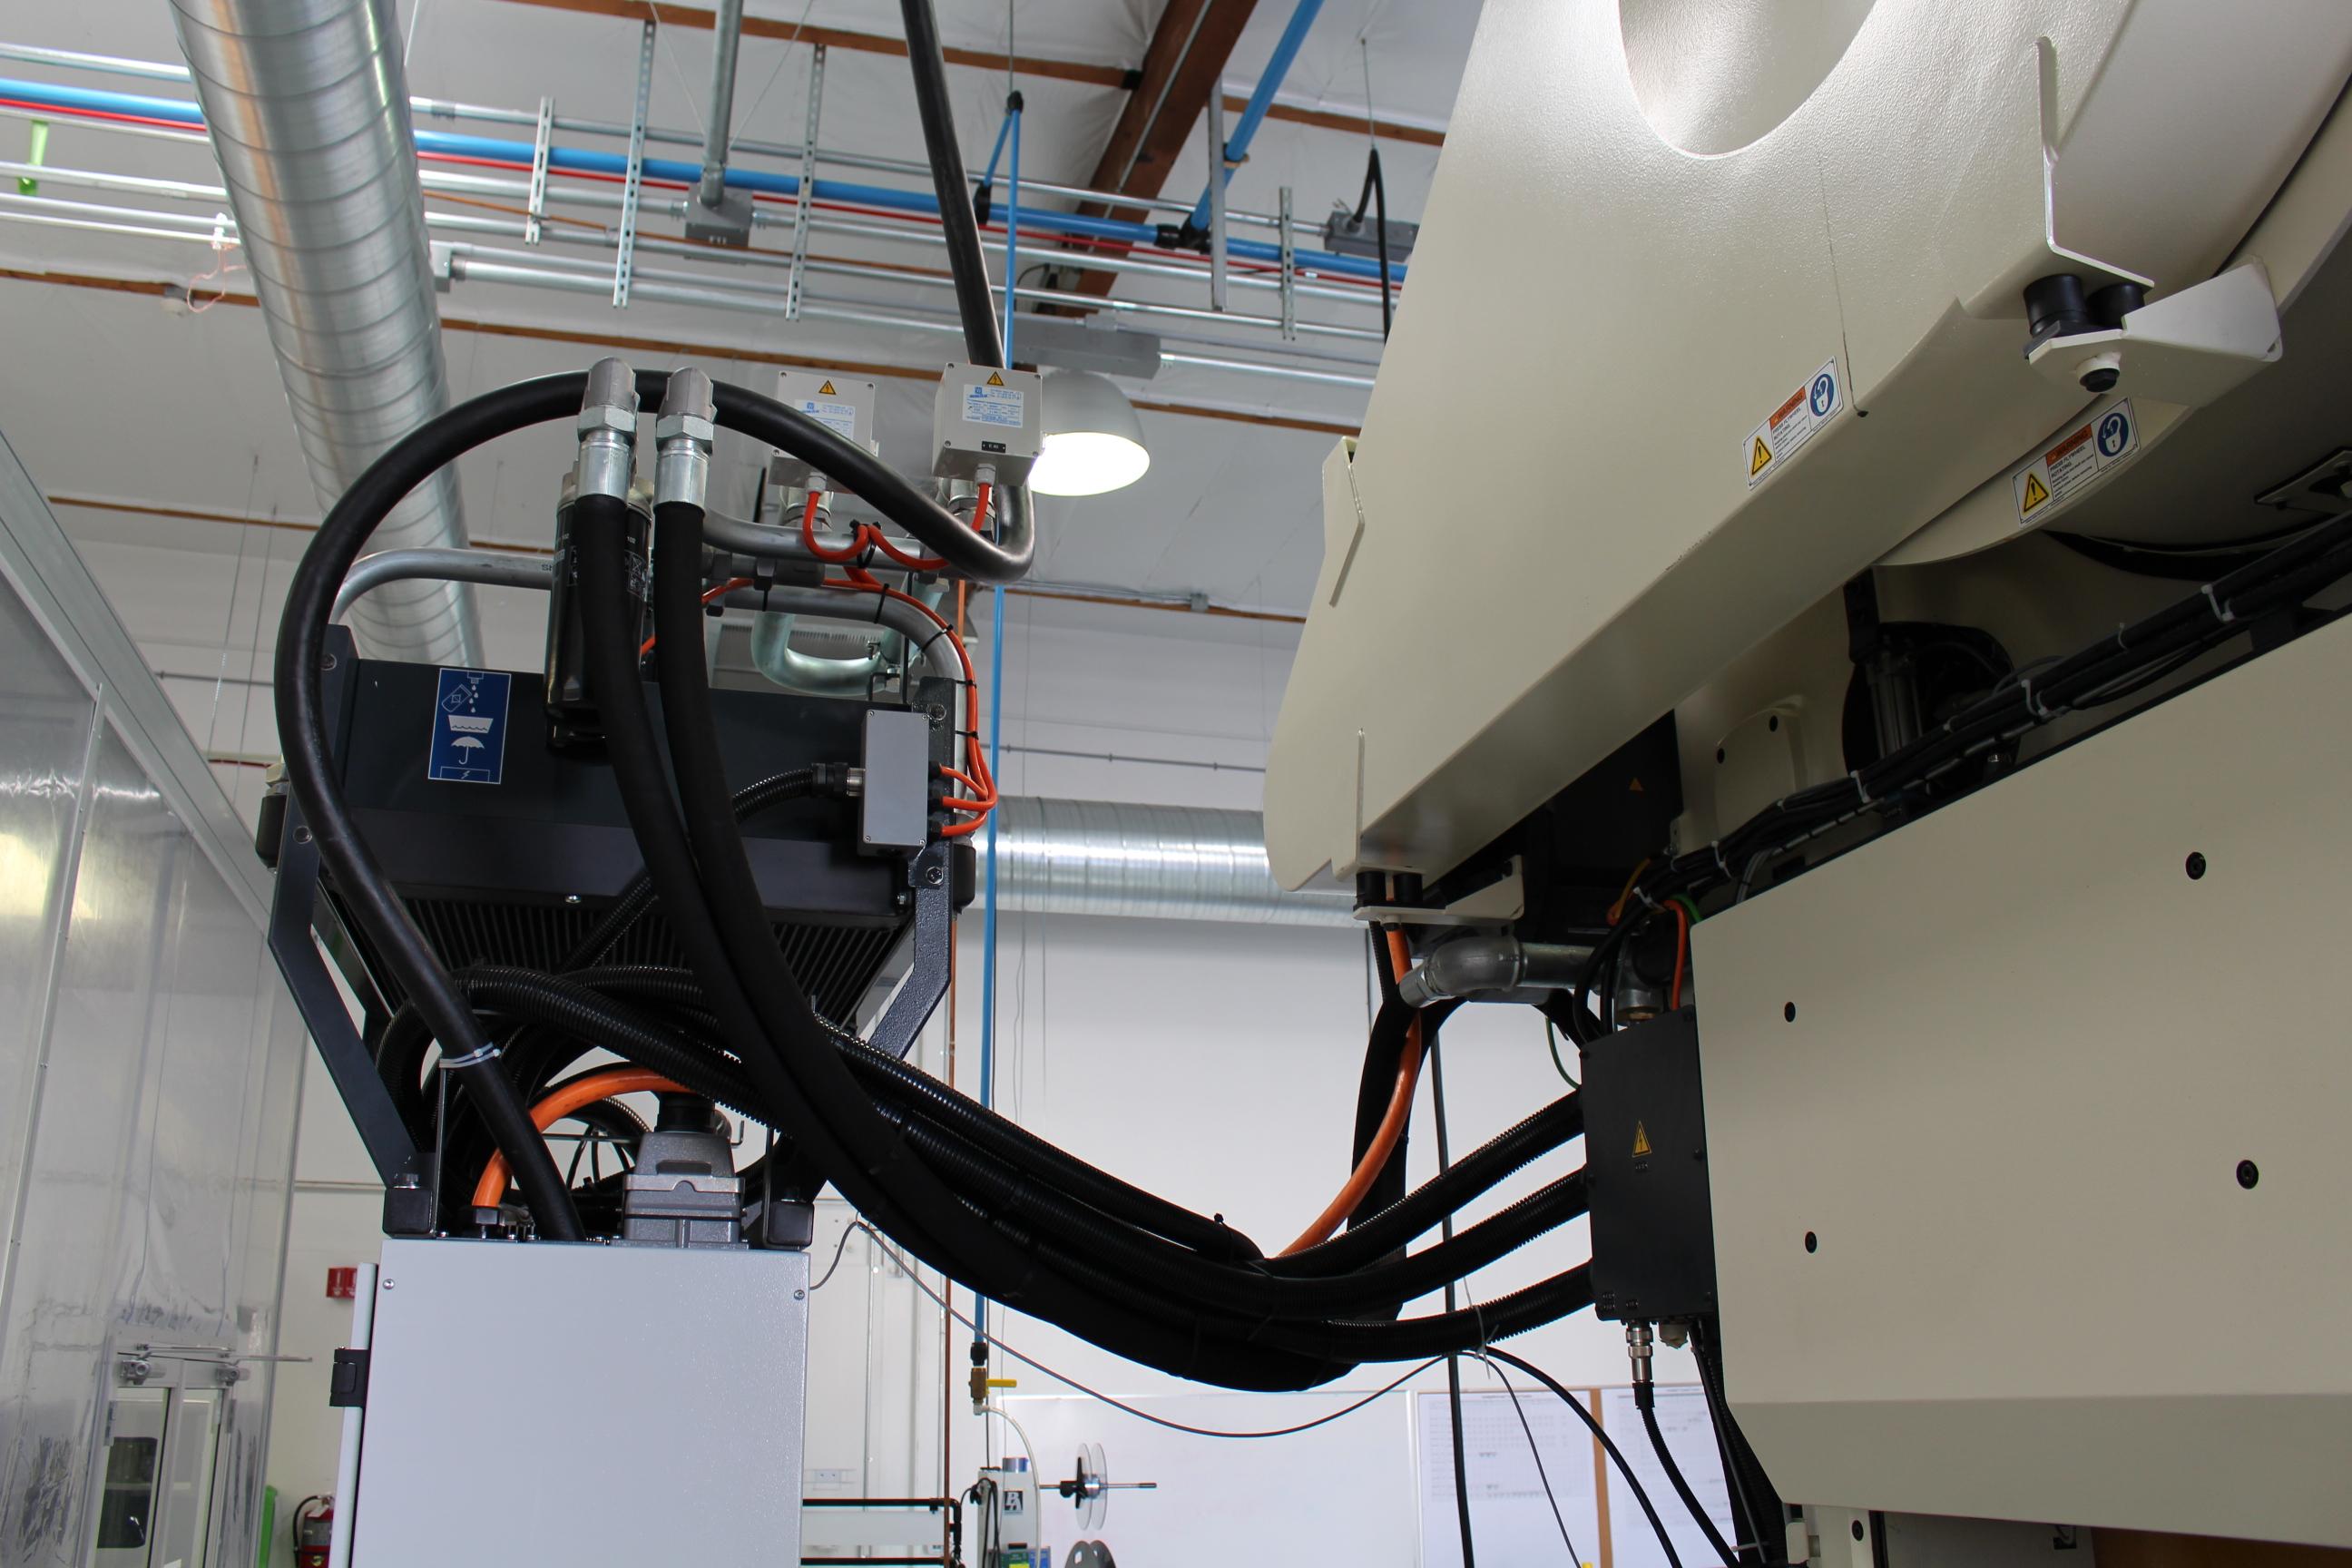 Lot 1 - 2014 BRUDERER HIGH SPEED STAMPING PRESS, MODEL BSTA 1250-151, 1250 KN TON, B2 CONTROL, 600 SPM